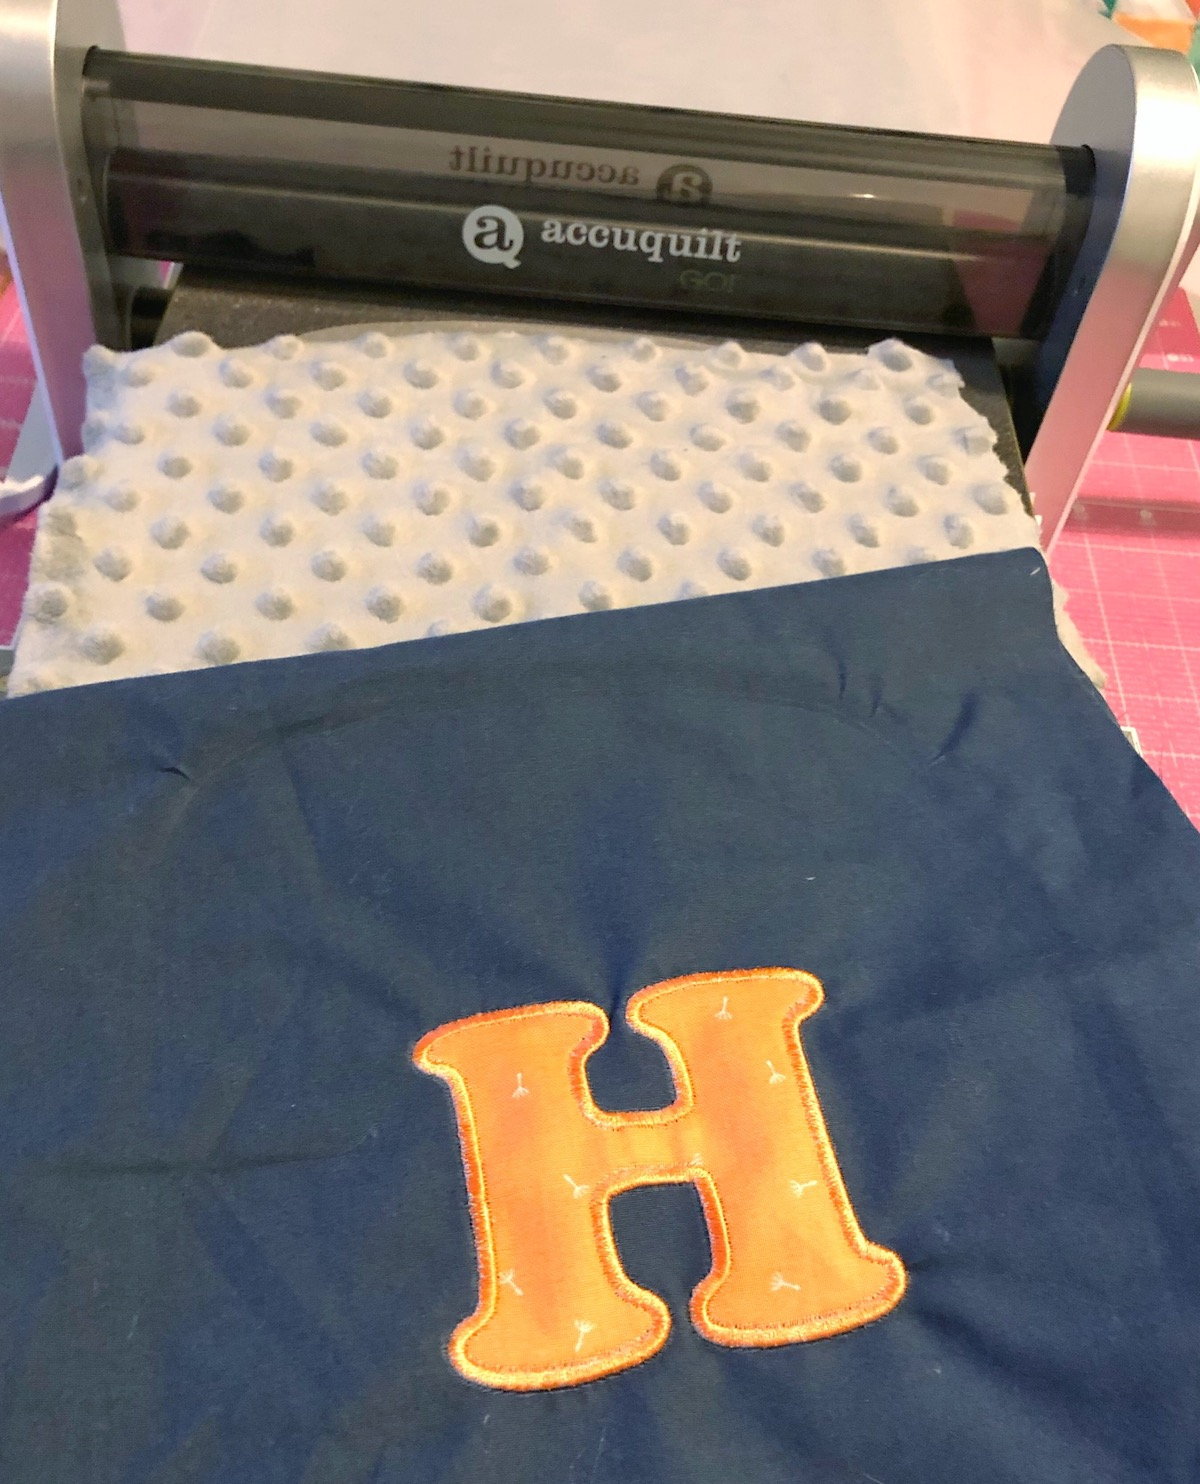 carefree accuquilt go fabric cutter